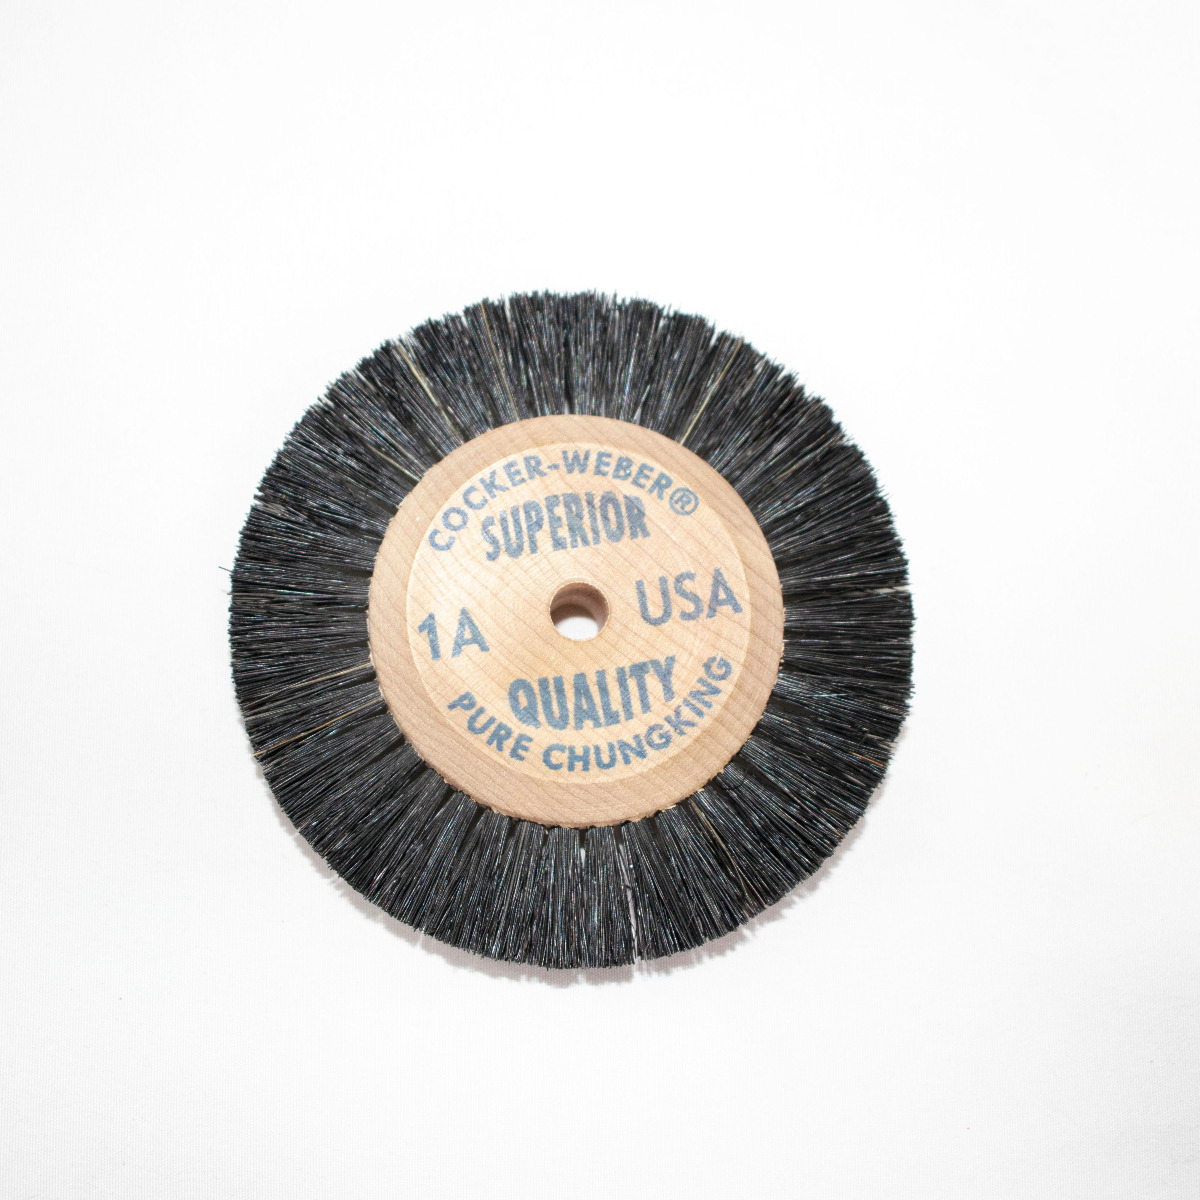 "1A Blue Label Cocker Weber Brushes, 5/8"" Trim Hair"